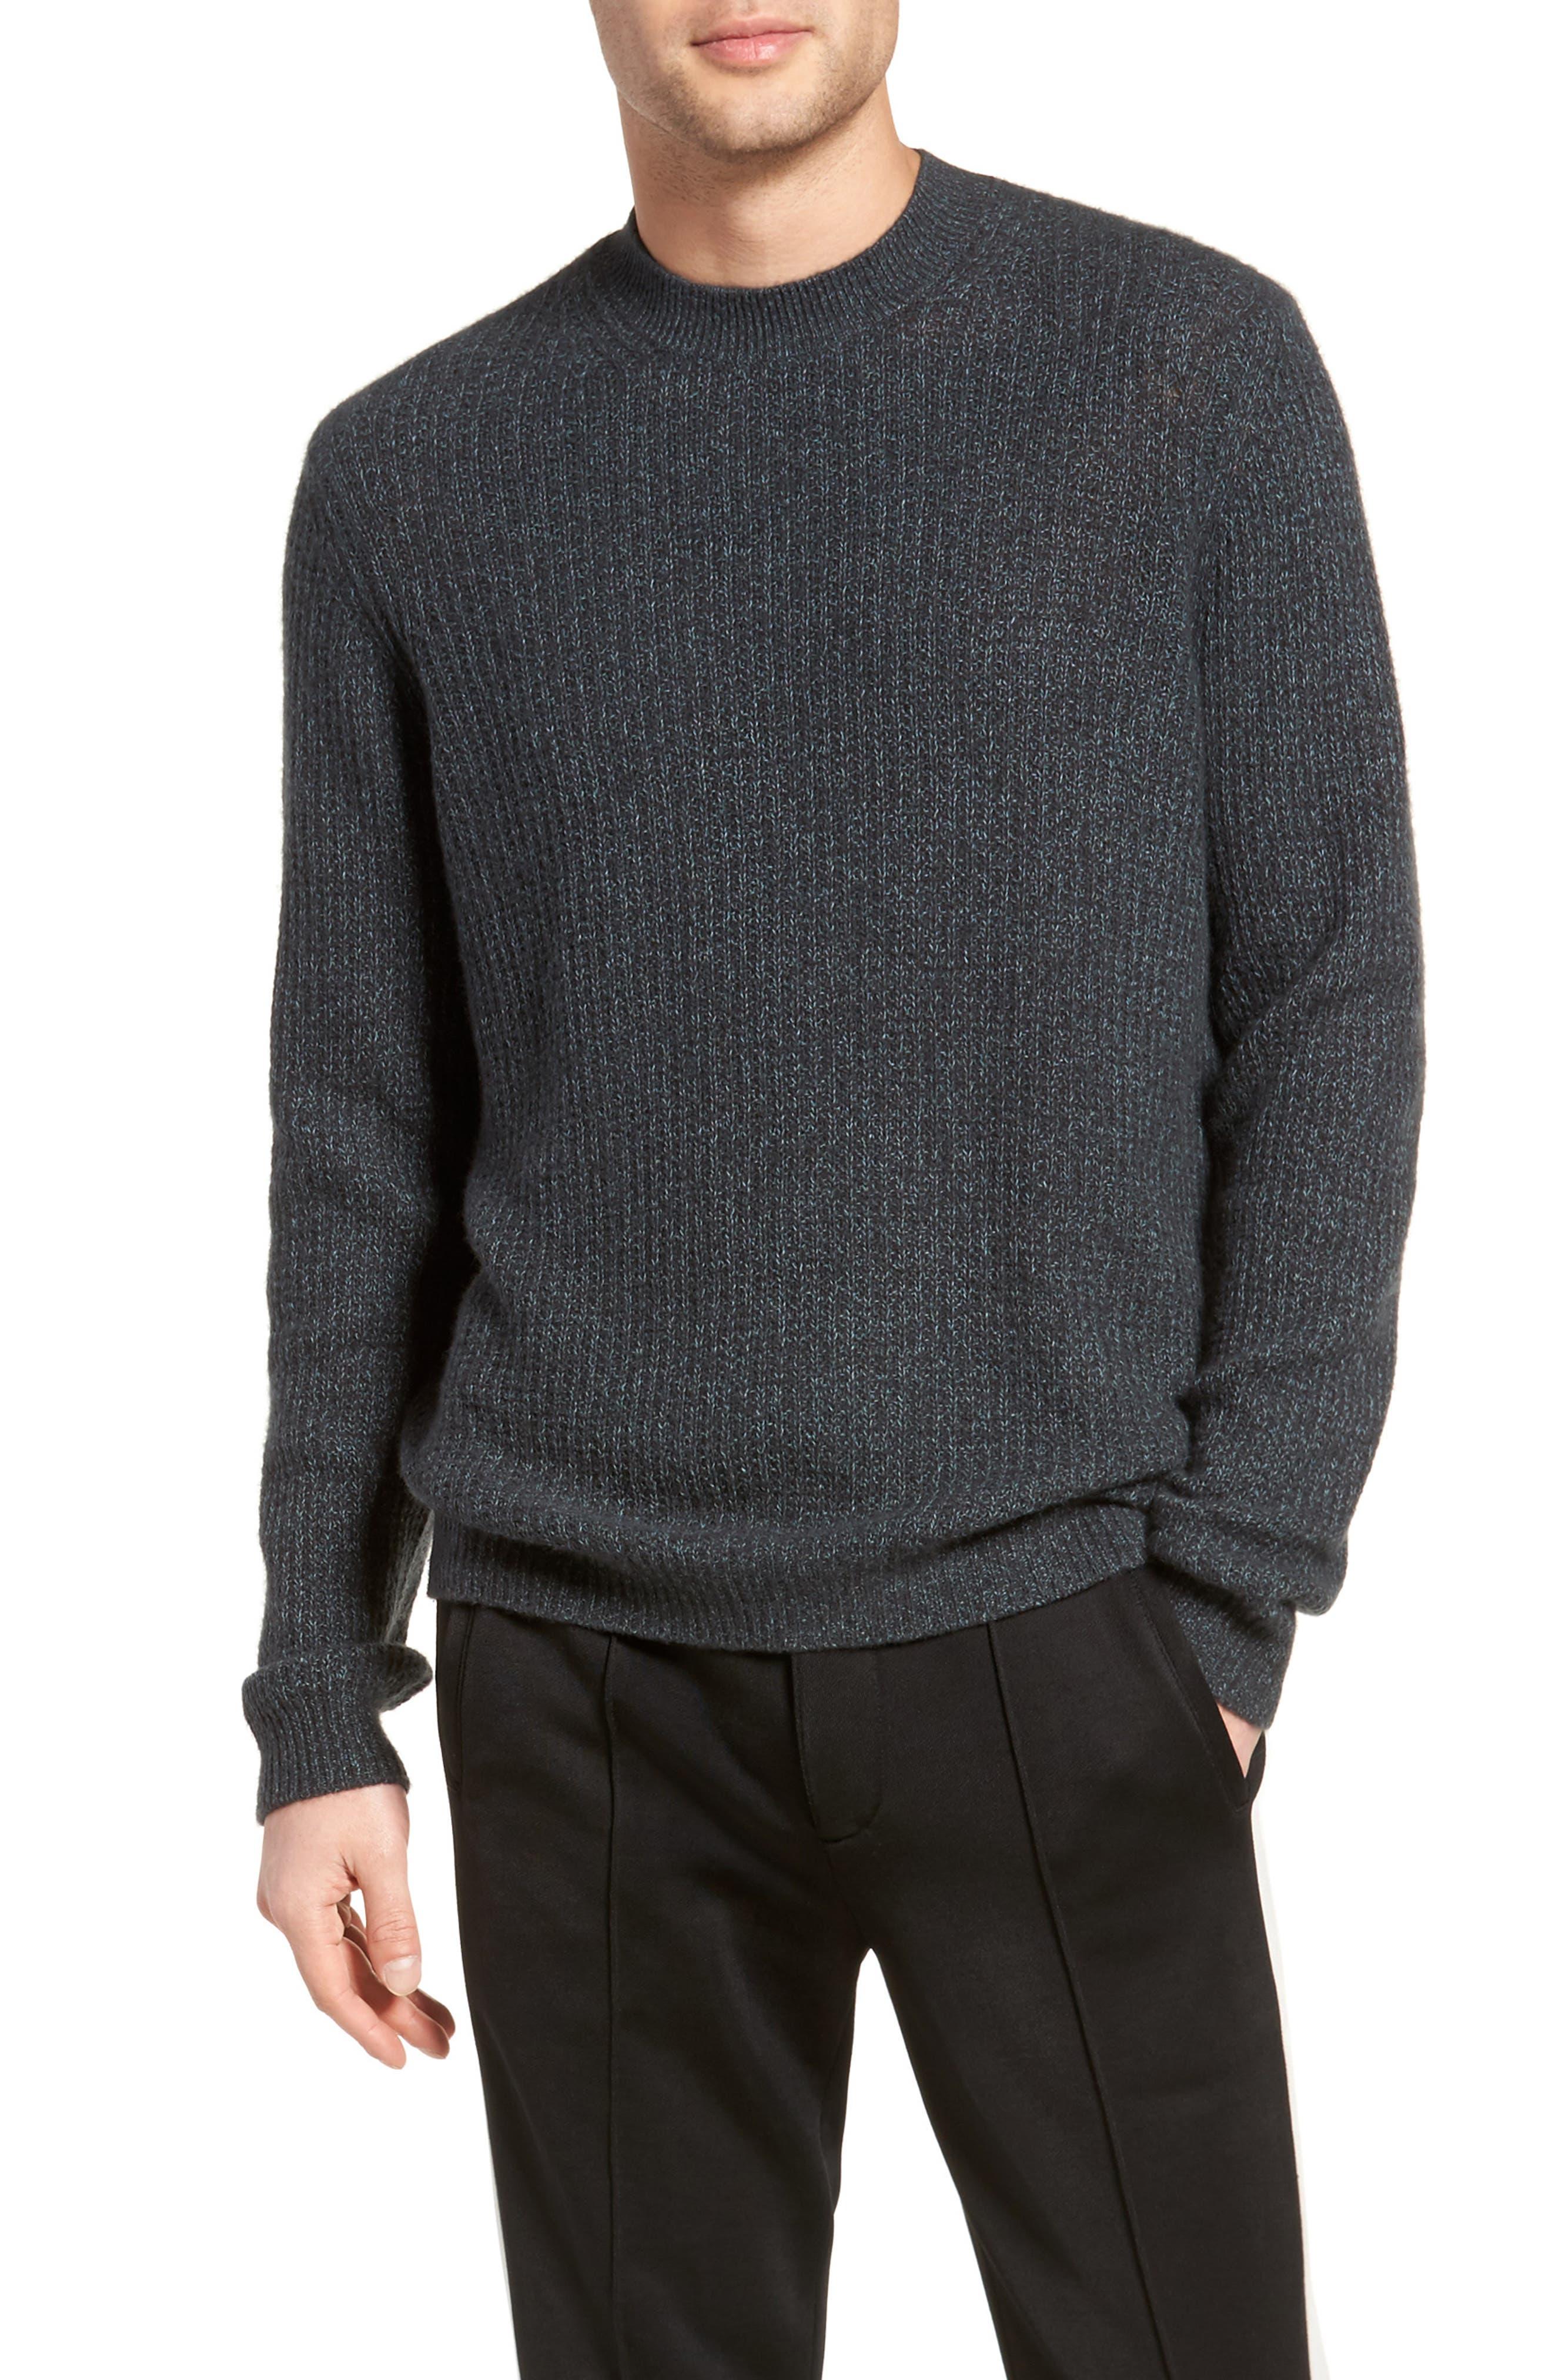 Thermal Knit Crewneck Cashmere Sweater,                         Main,                         color, Beetle/ Mint